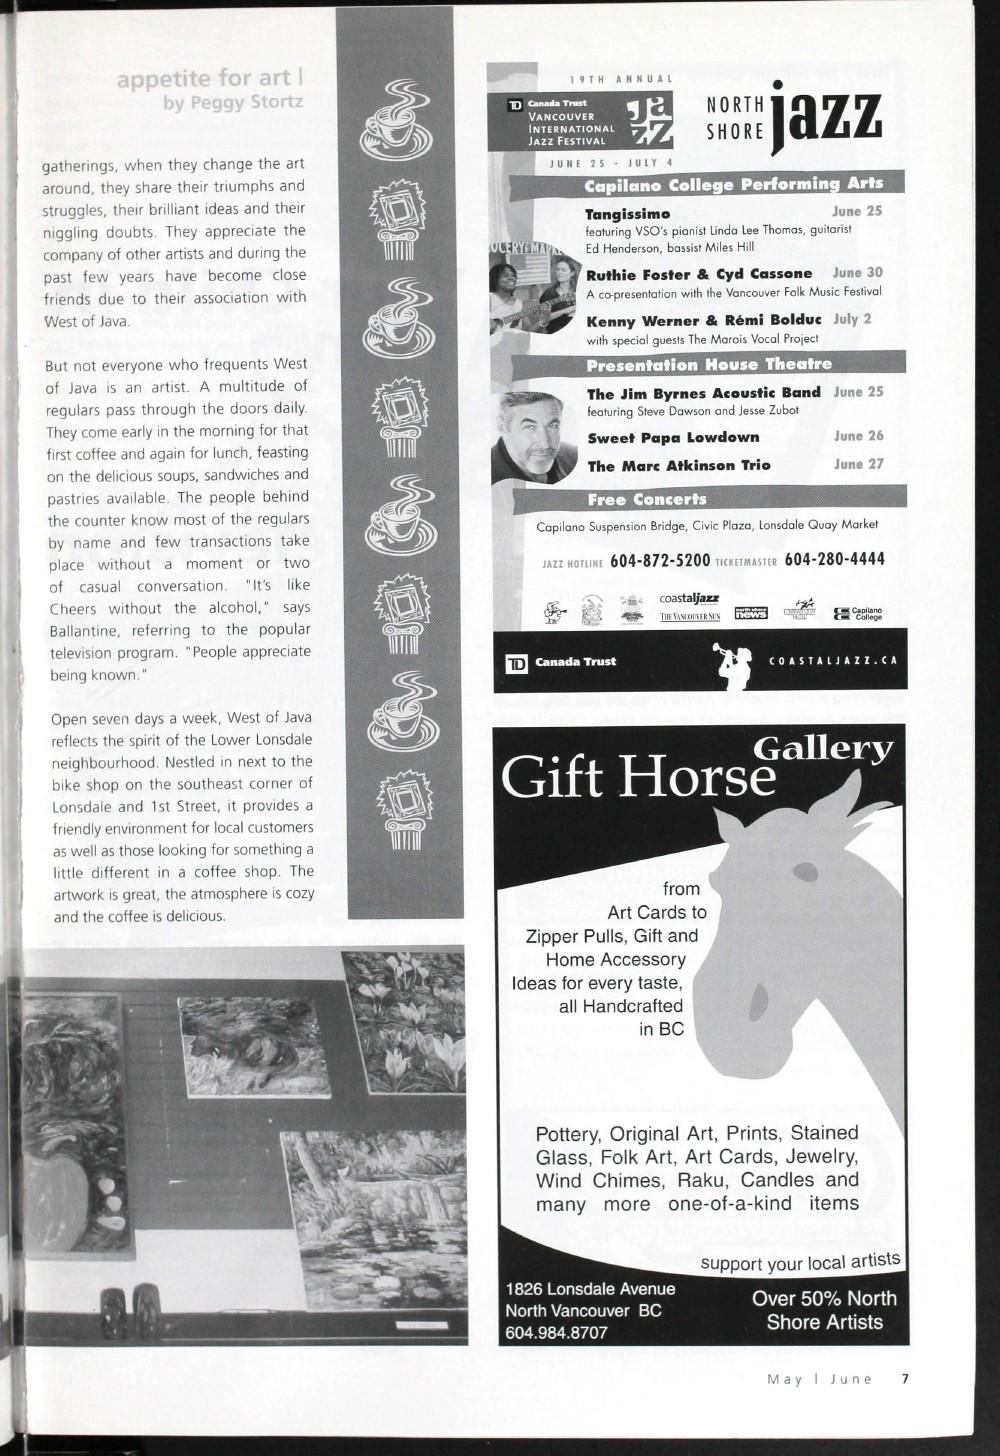 Arts Alive, May/June 2004